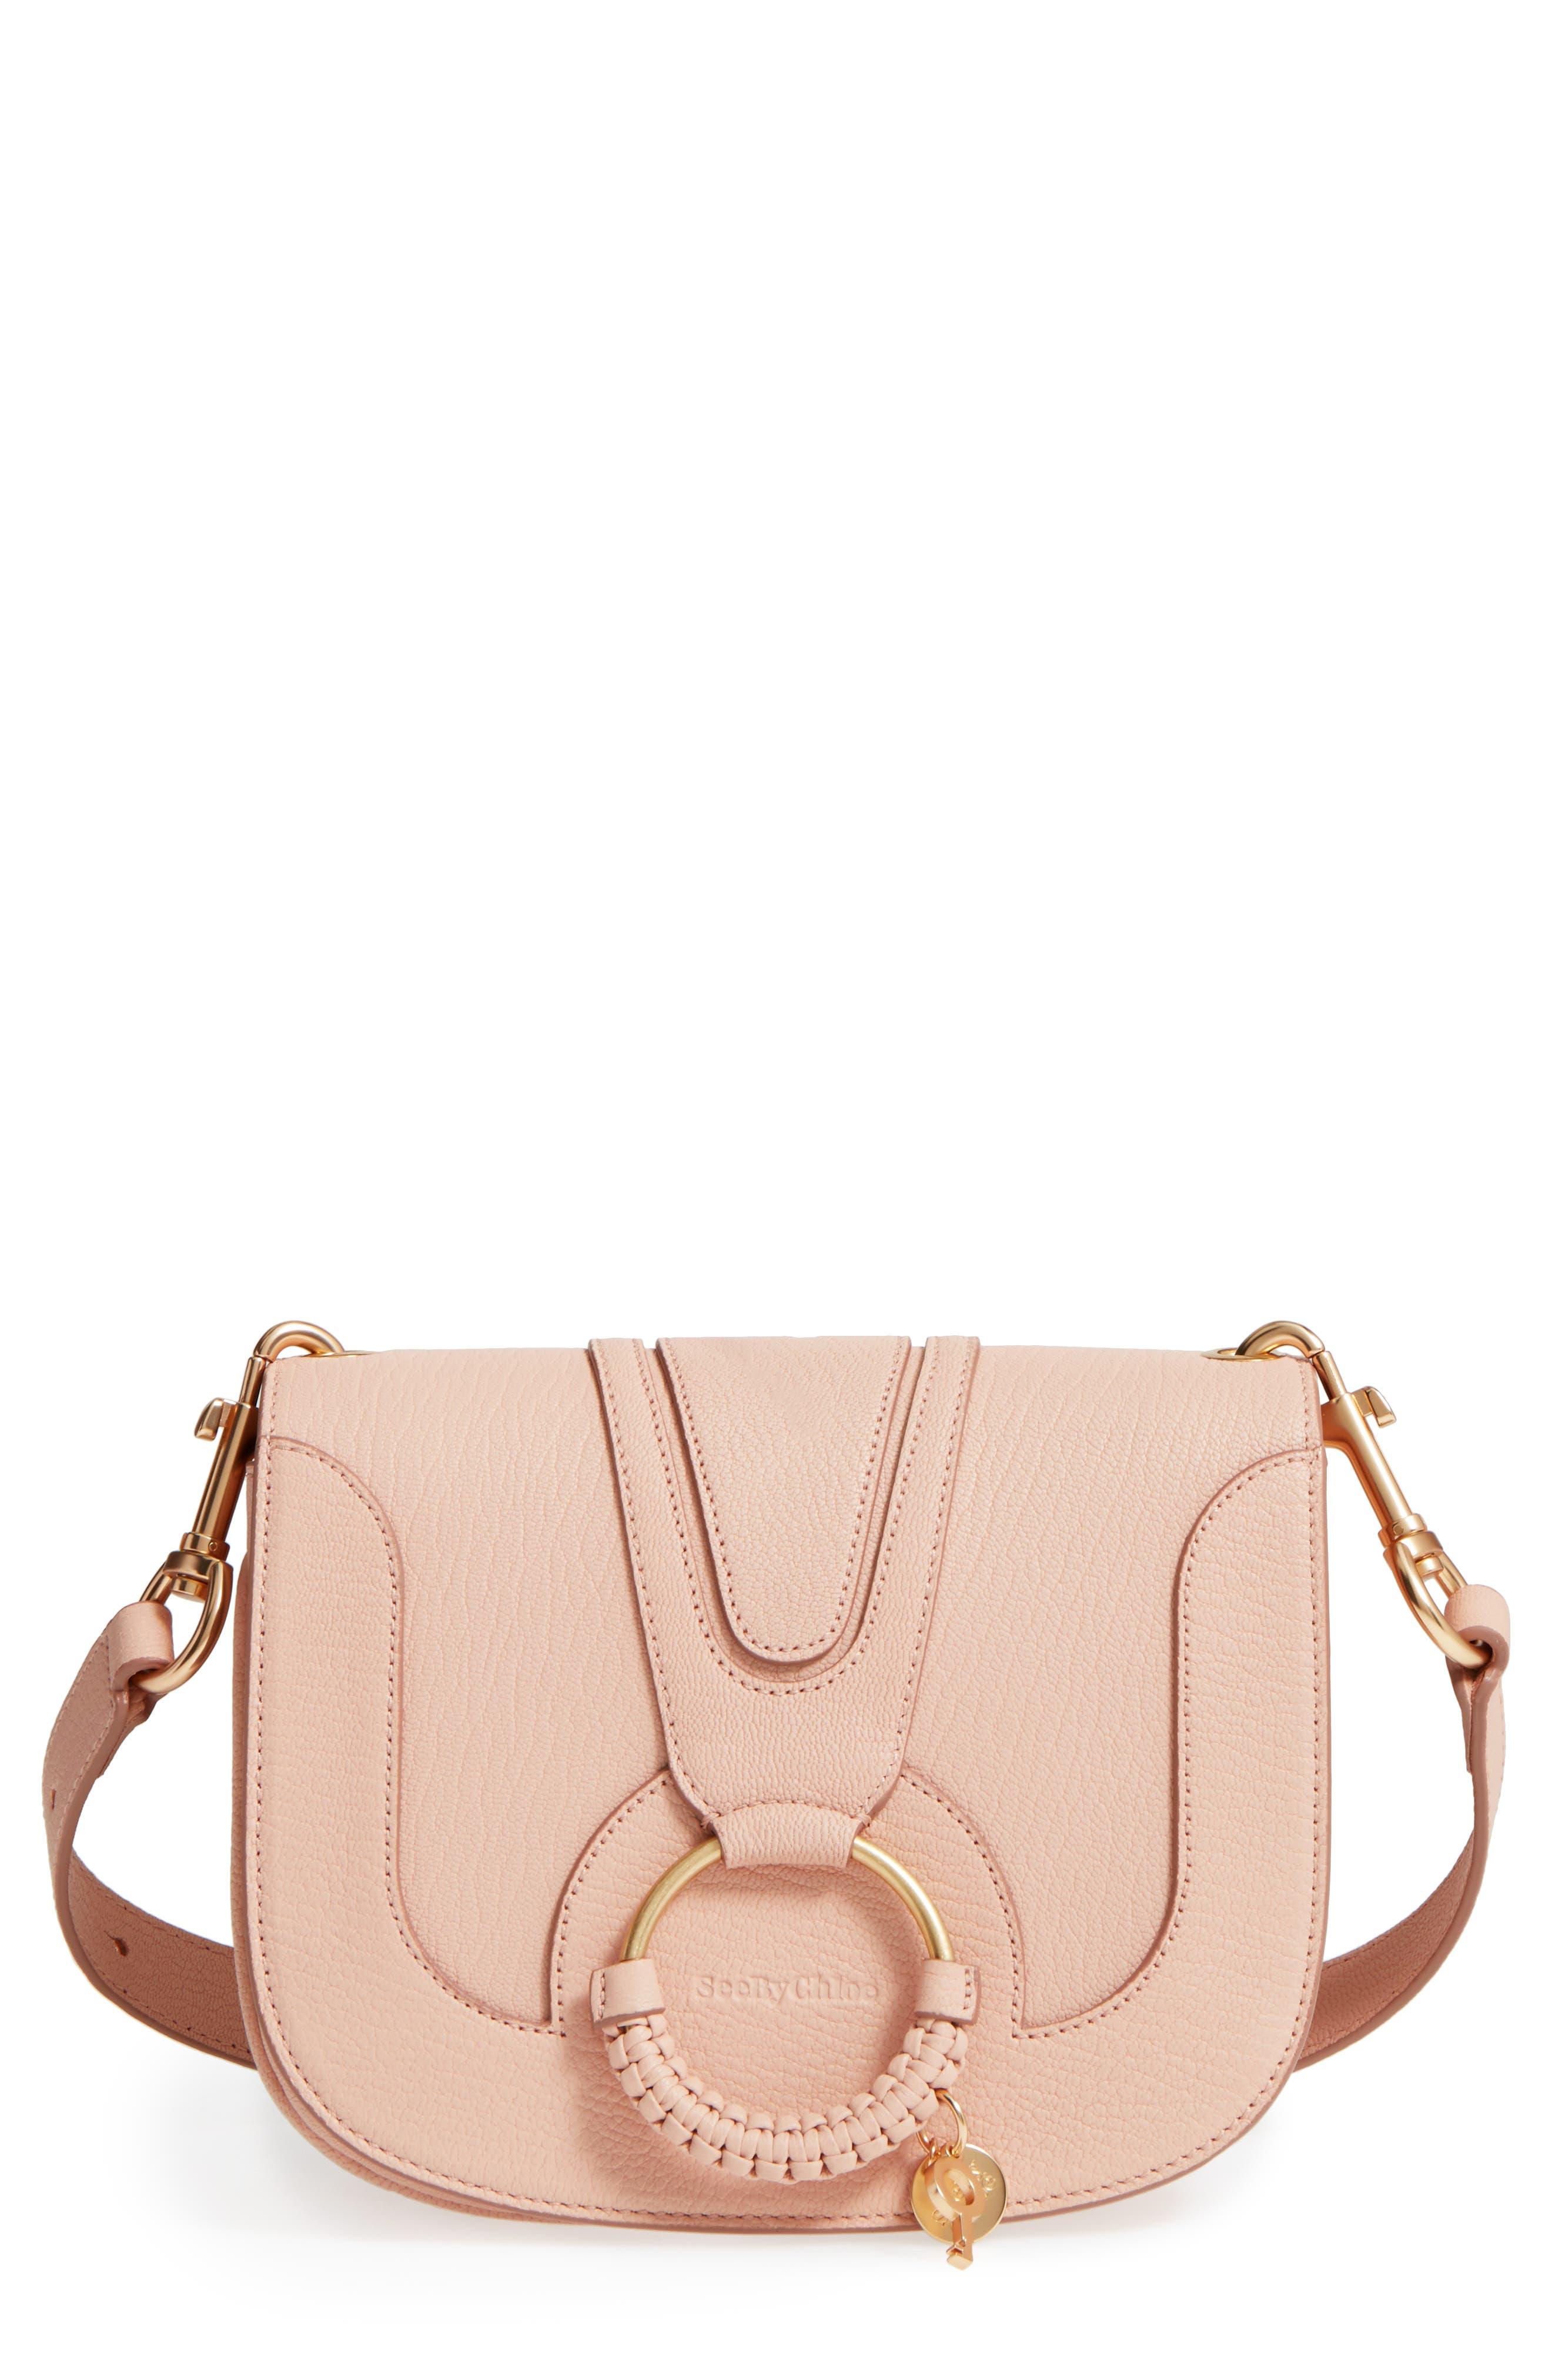 Hana Small Leather Crossbody Bag,                             Main thumbnail 8, color,